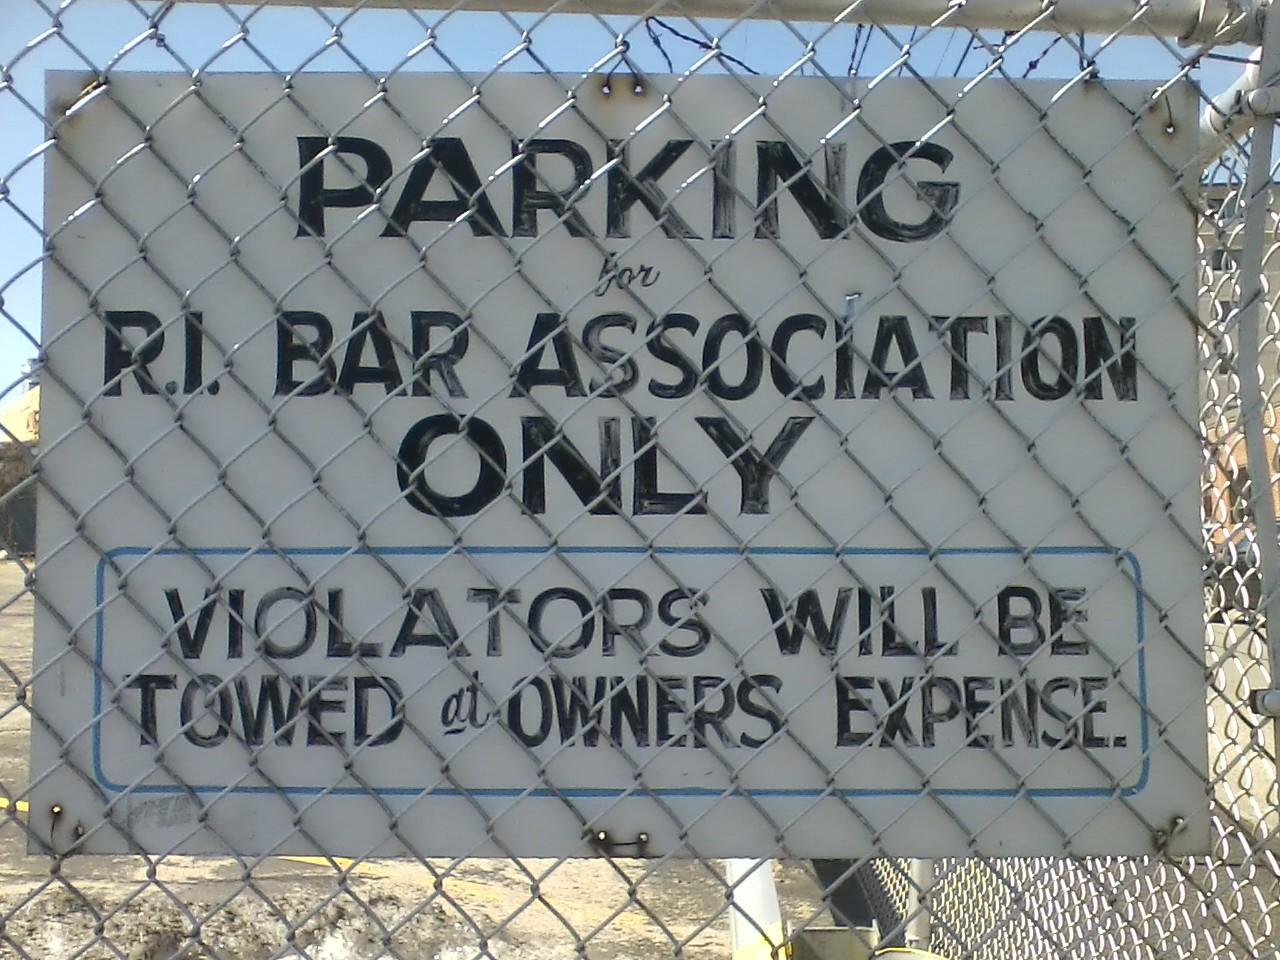 R.I. Bar Association